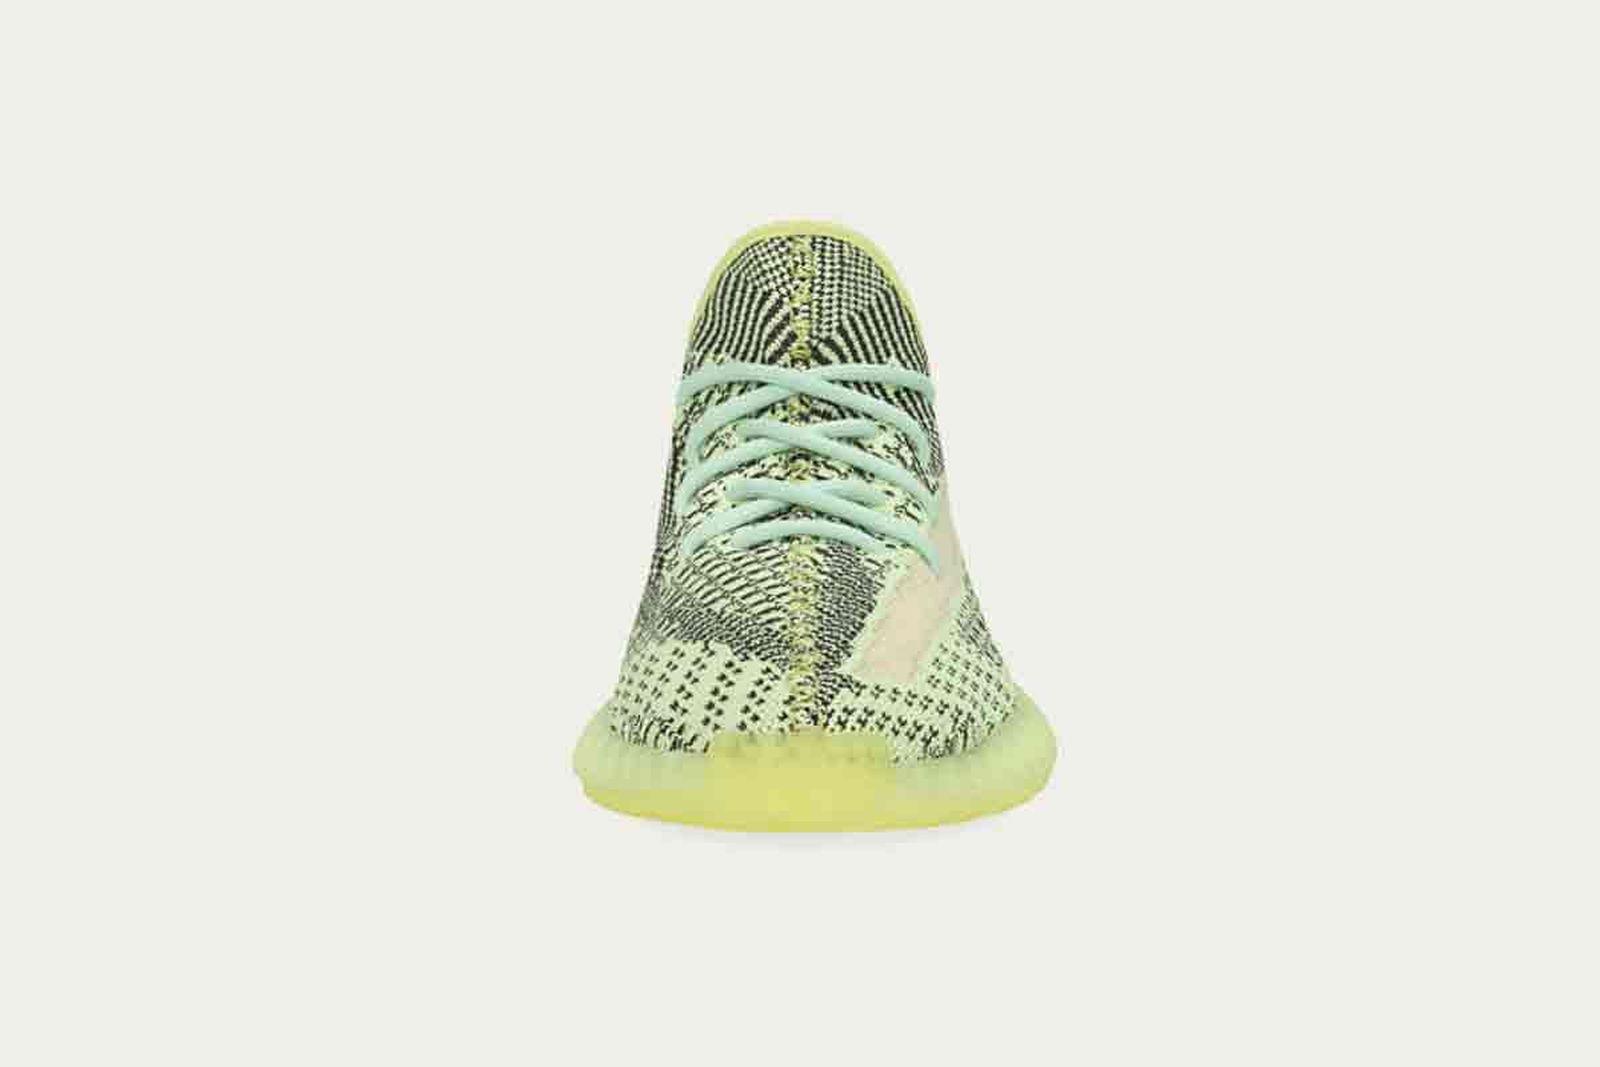 adidas-yeezy-boost-350-v2-yeezyreel-release-date-price-09